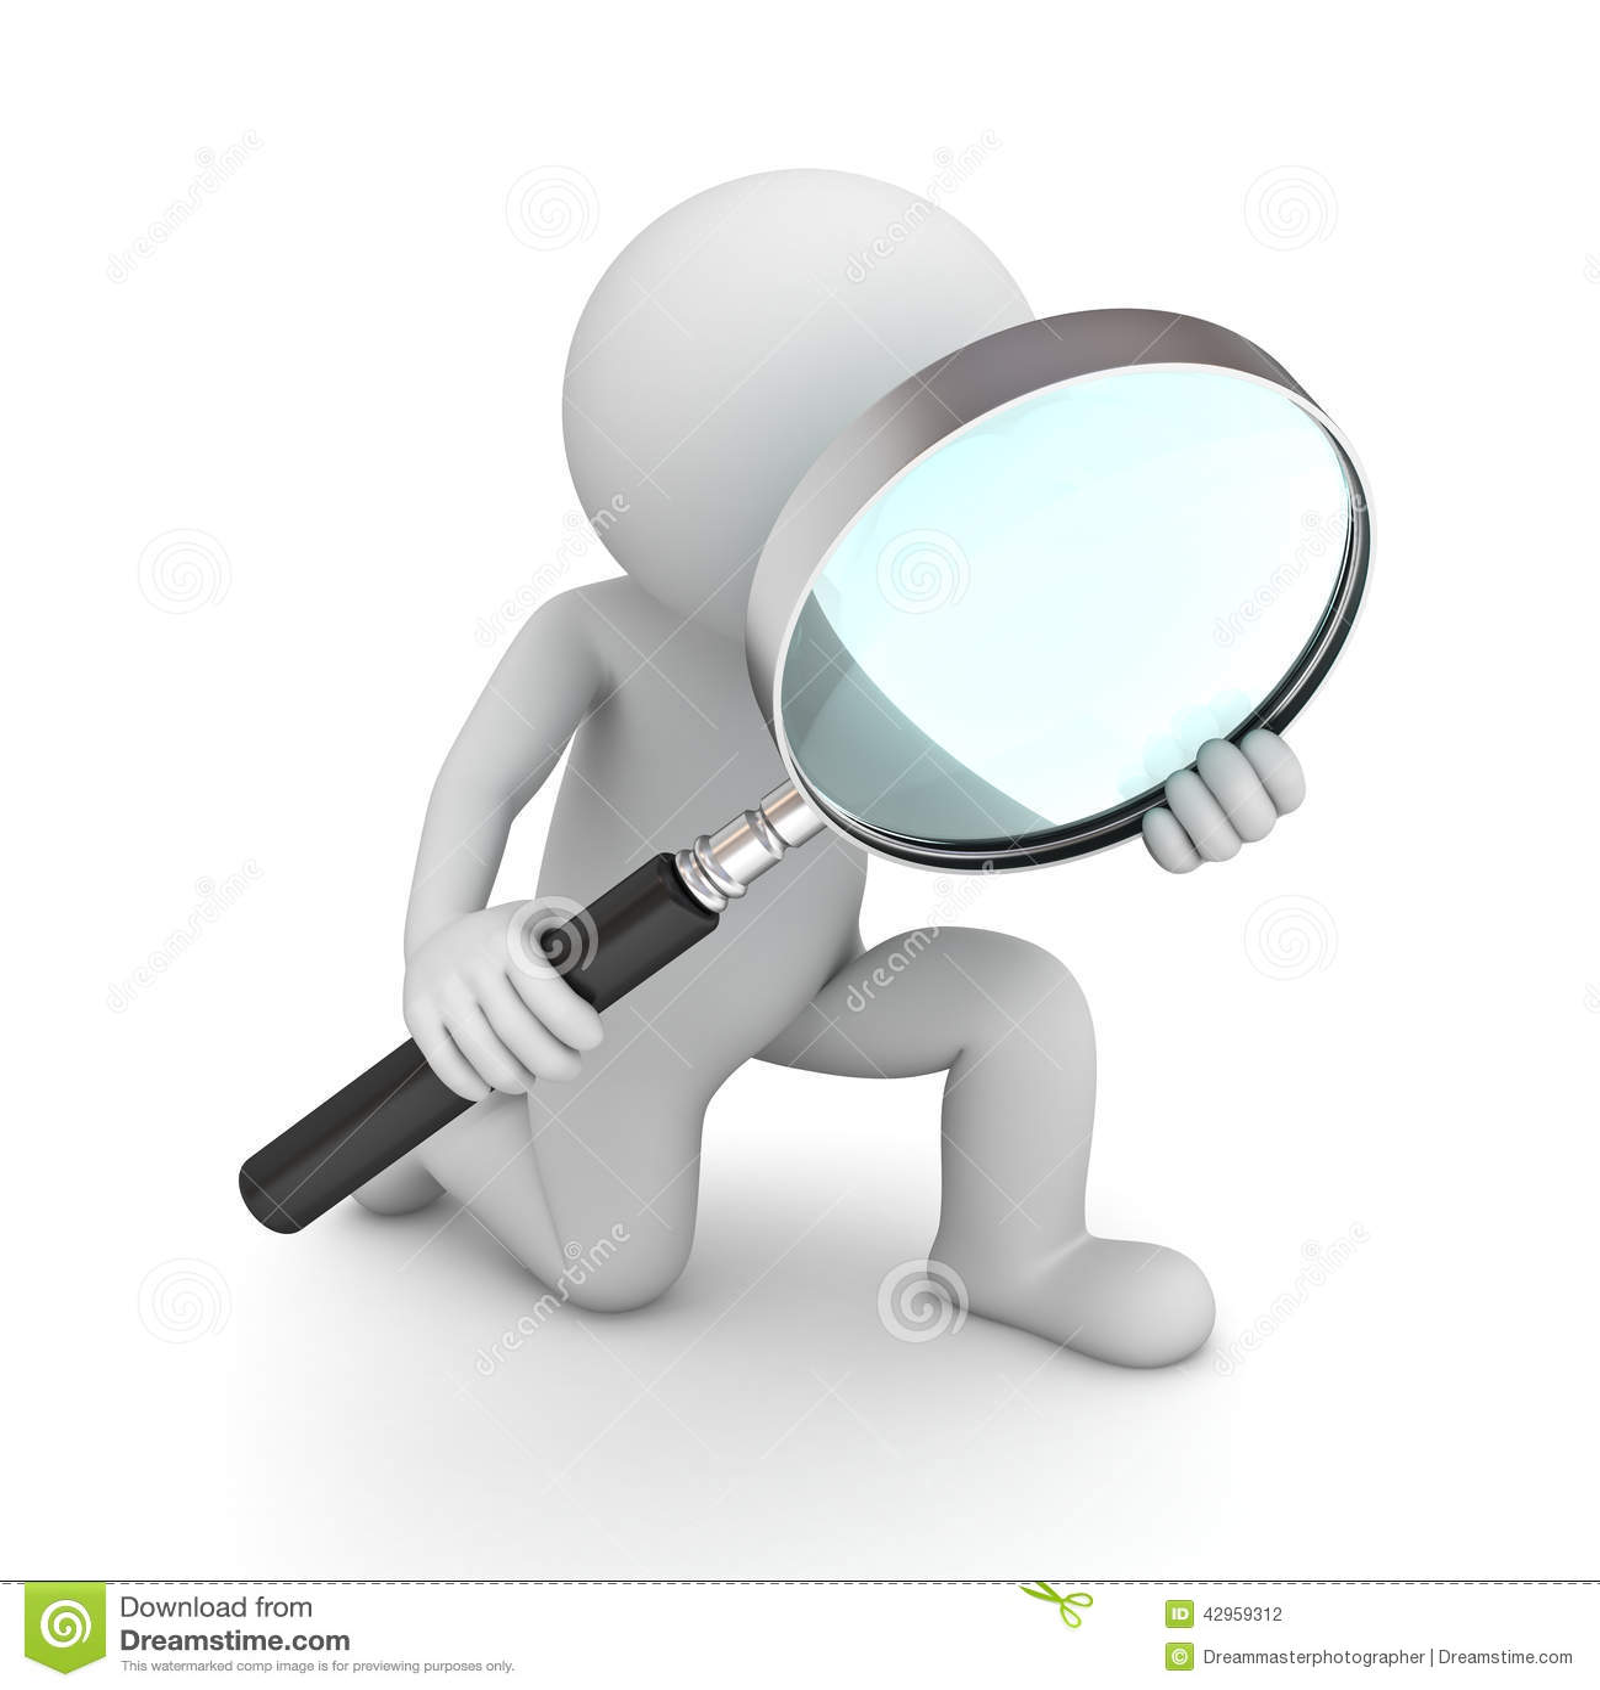 Black Magnifier Stock Photos, Royalty-Free Images & Vectors ...